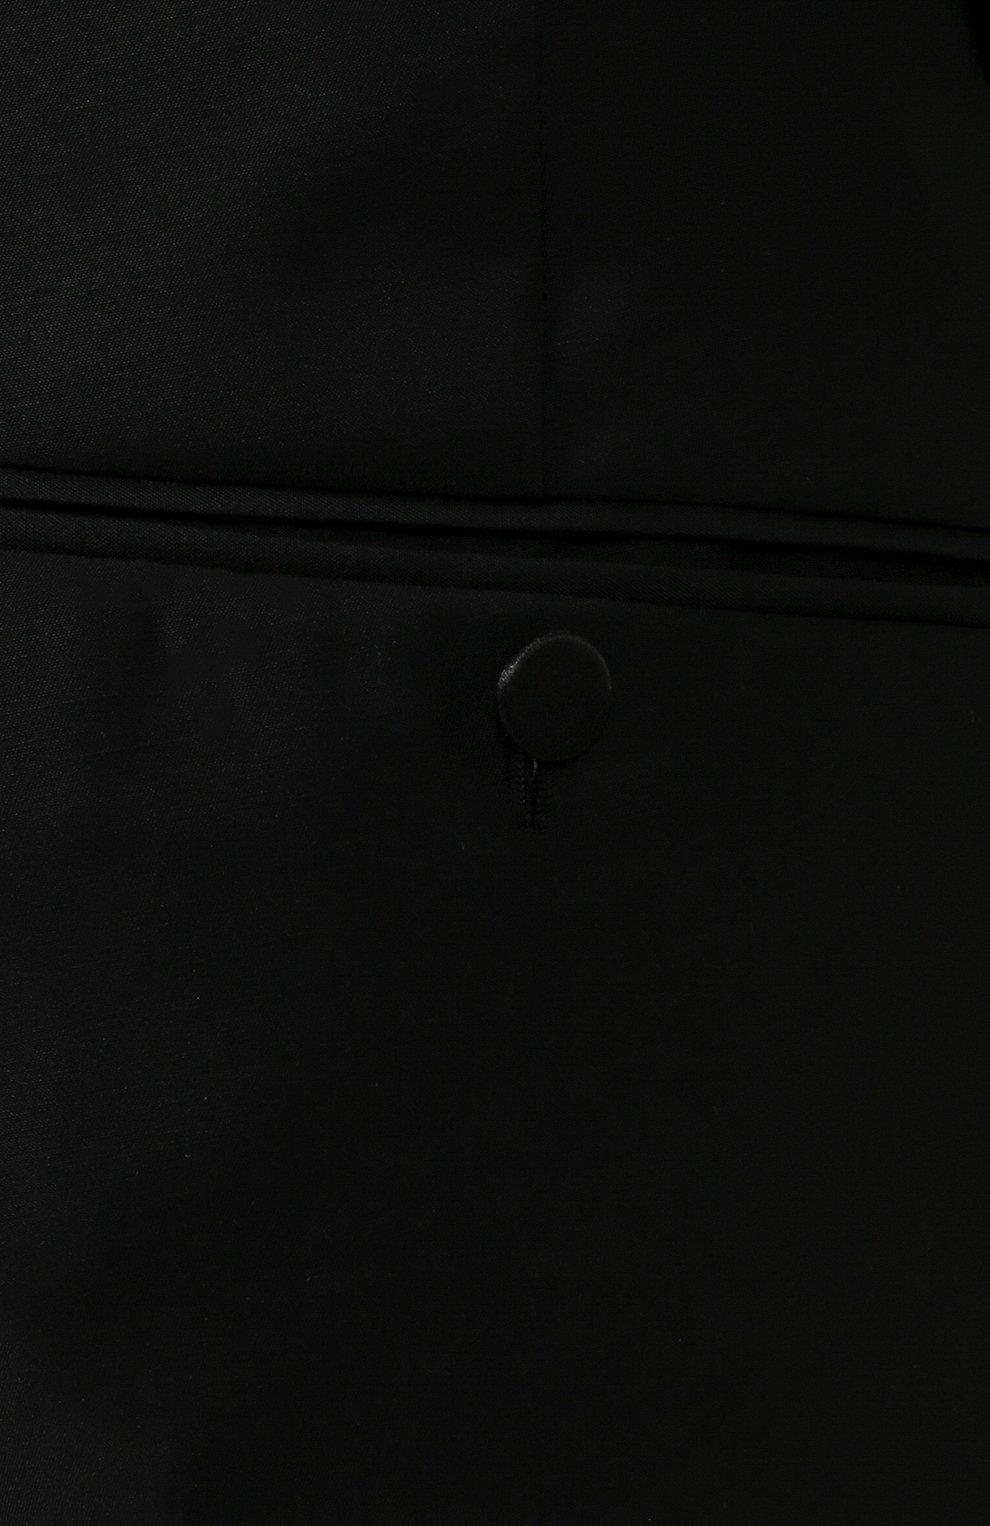 Мужские брюки из смеси шерсти и шелка DSQUARED2 черного цвета, арт. S74KB0379/S39408 | Фото 5